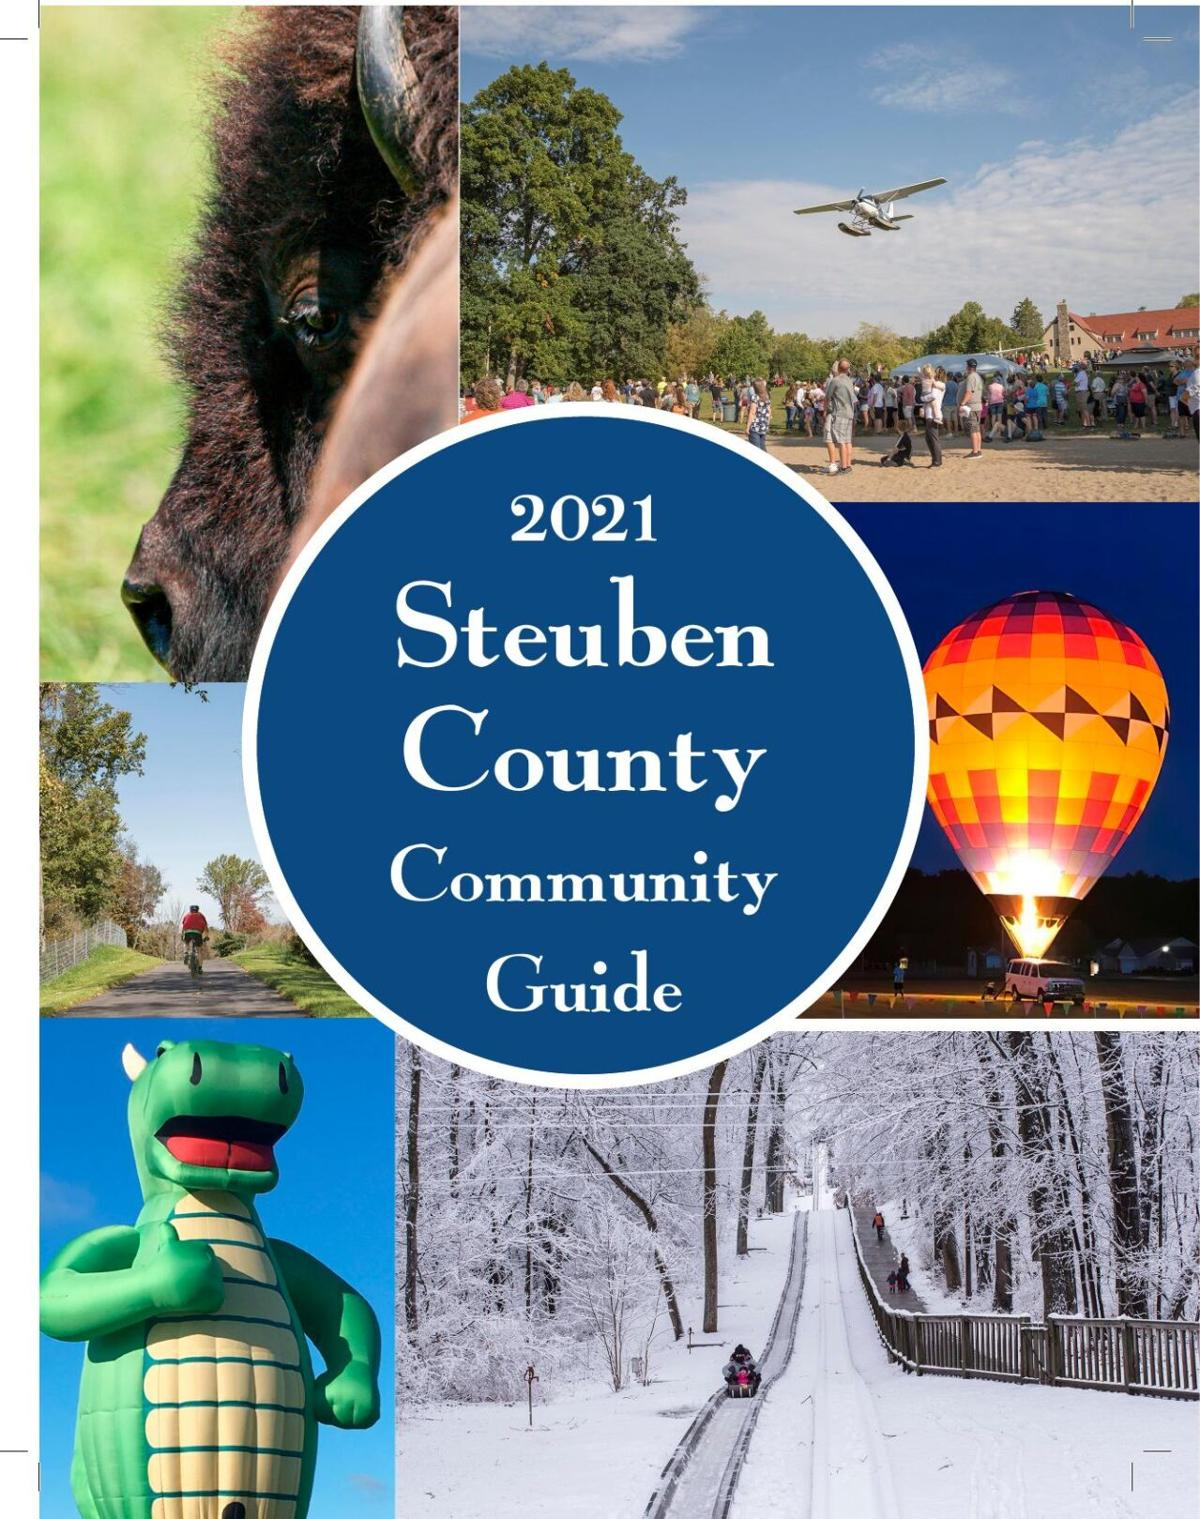 Steuben County Community Guide 2021